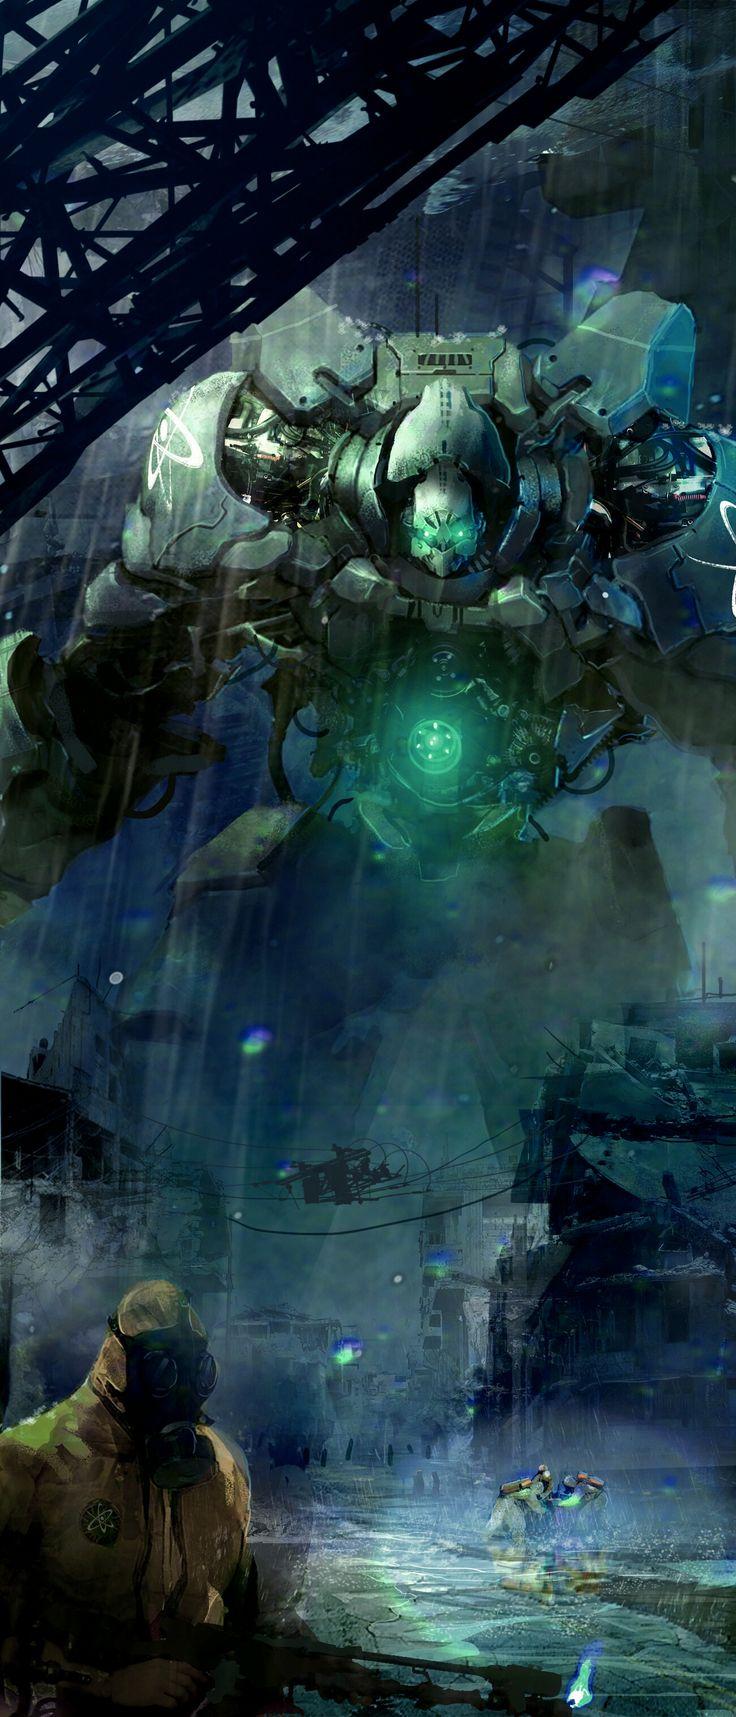 Quarantine Crew by Michael Morris | Sci-Fi | 2D | CGSociety